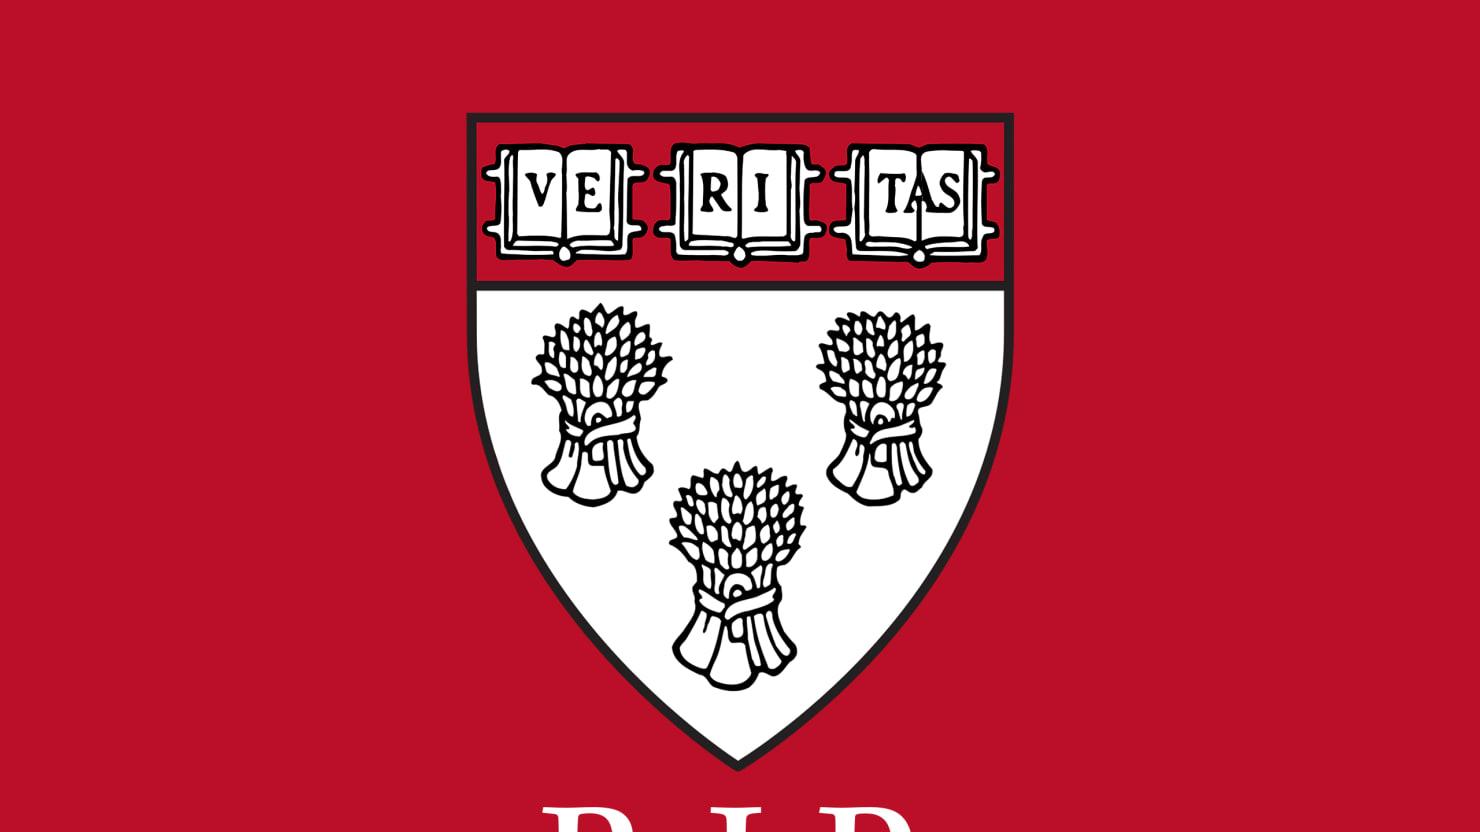 University Of Florida Law School >> Was Harvard Law School's Shield Racist Enough To Change?